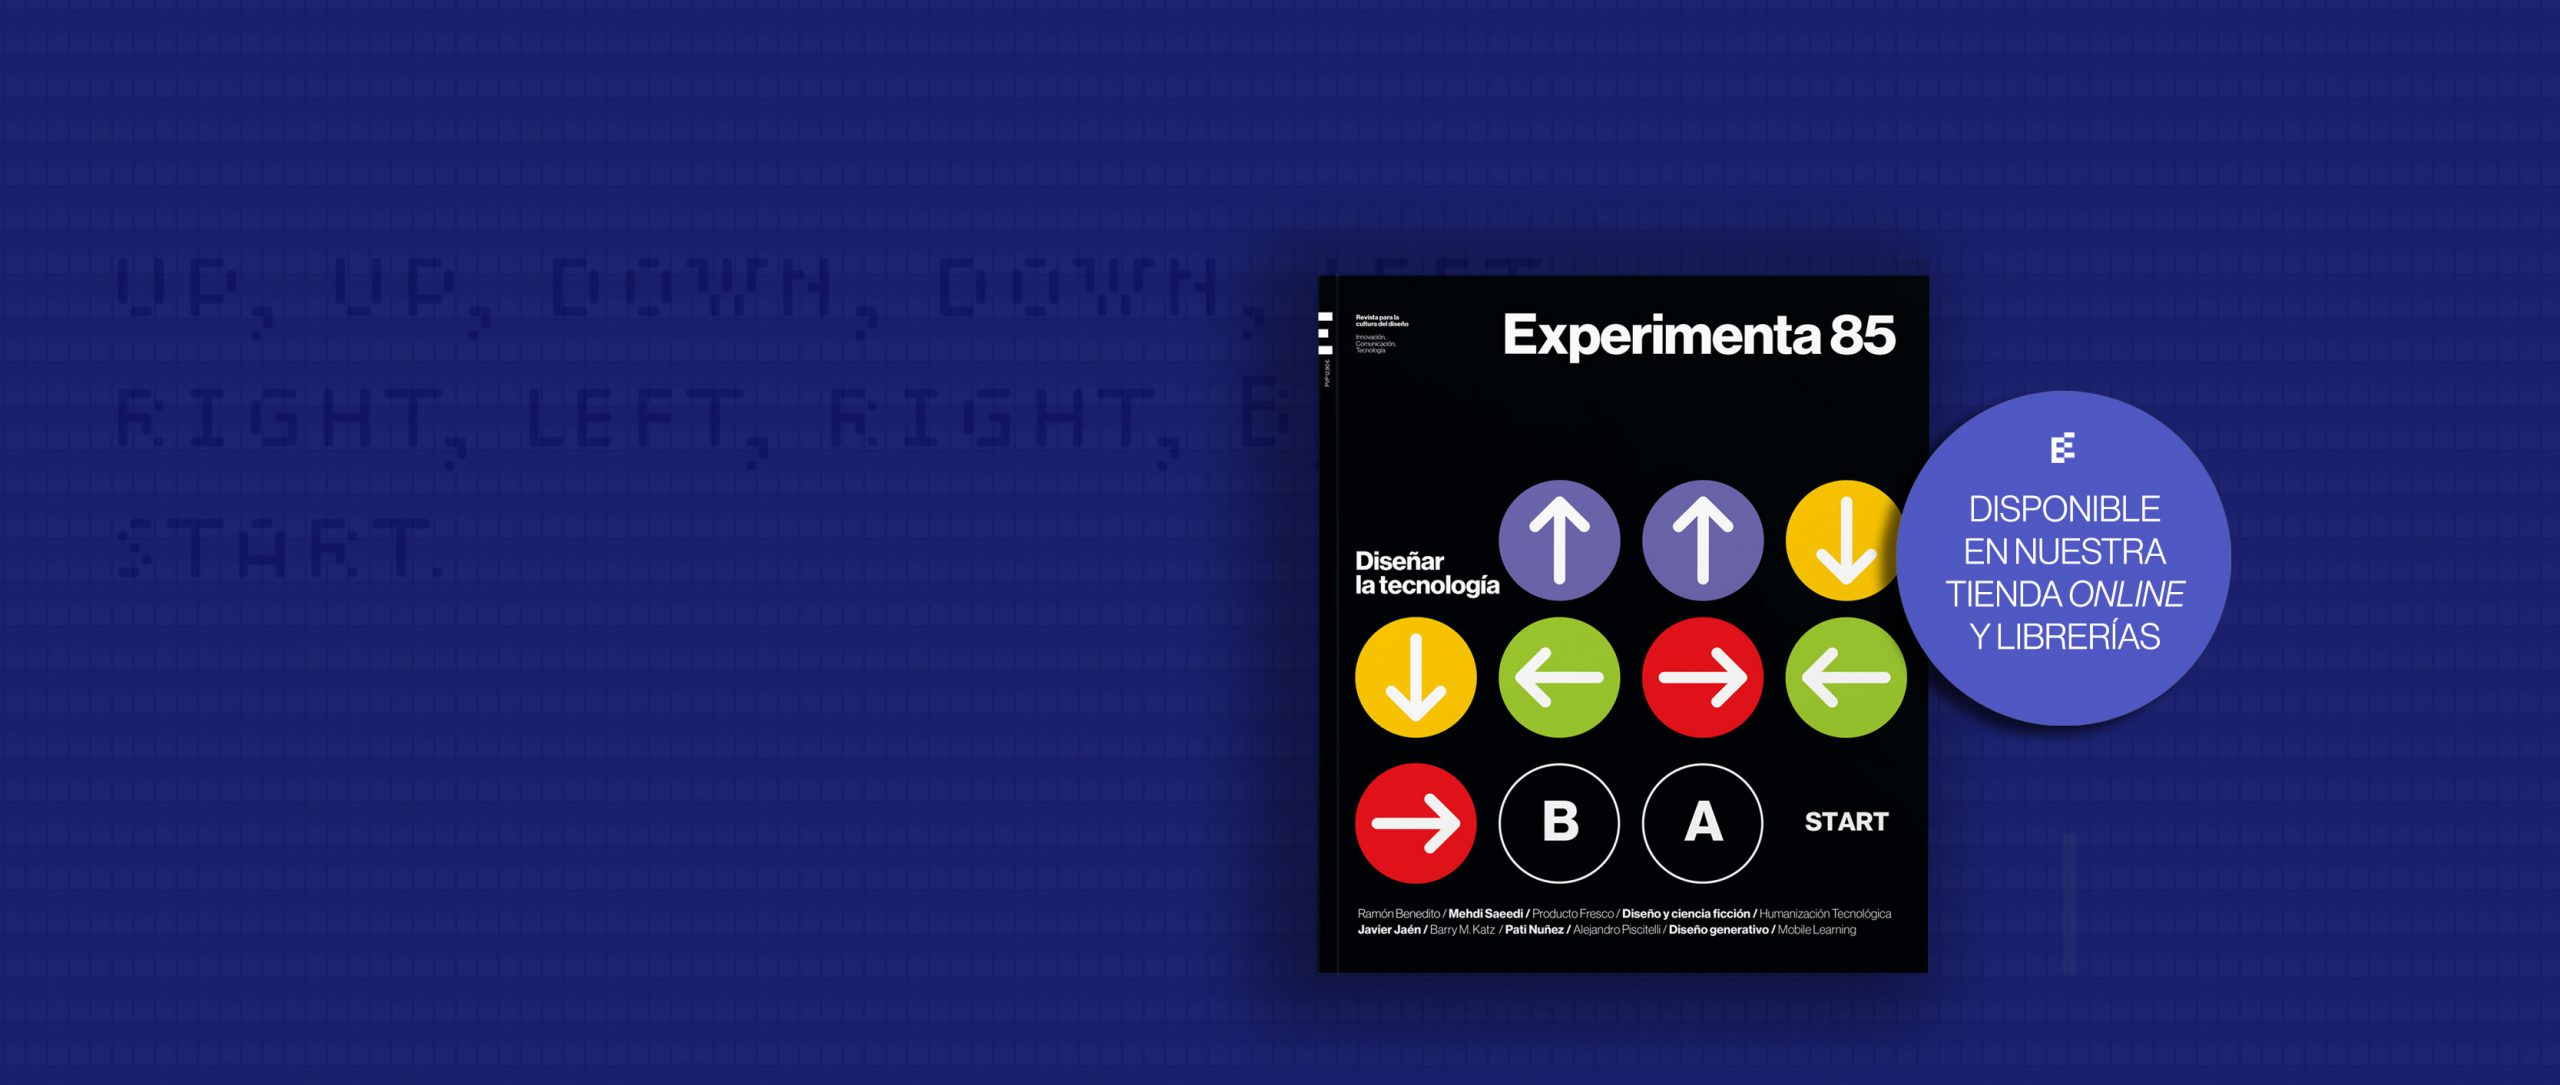 SLIDER-PRINCIPAL-EXPERIMENTA85